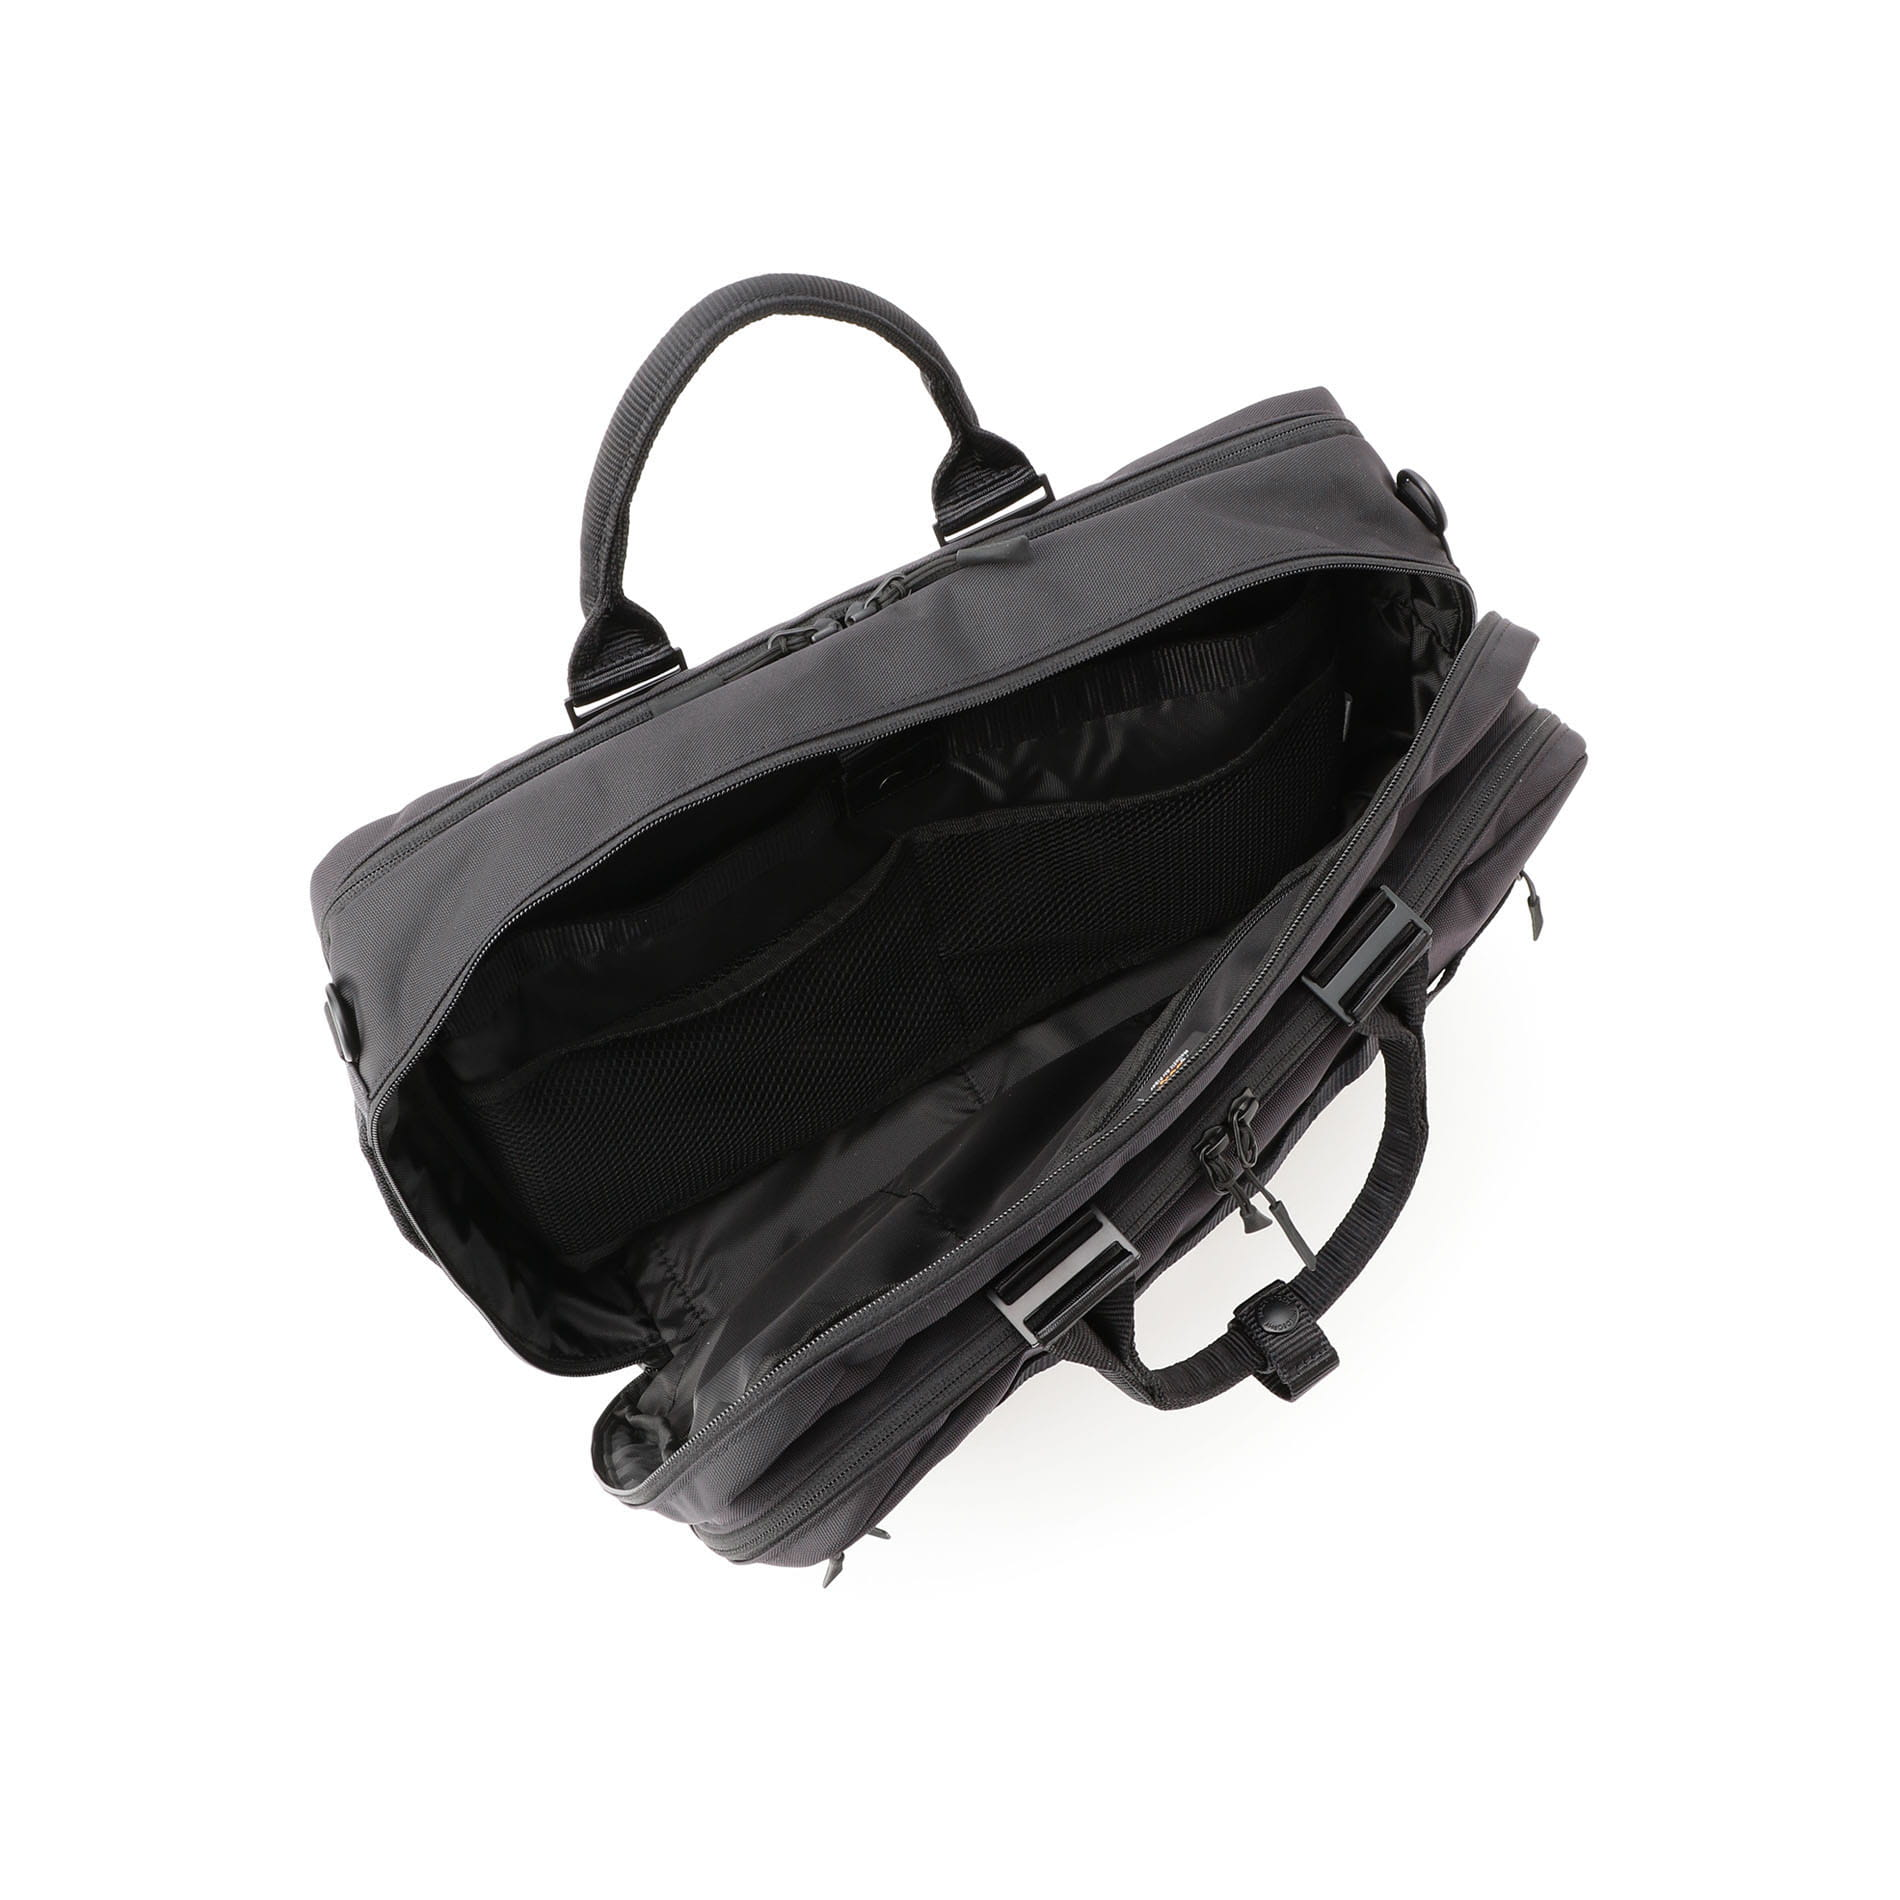 【TROTTER BAG】 トロッターバッグ3 3WAY